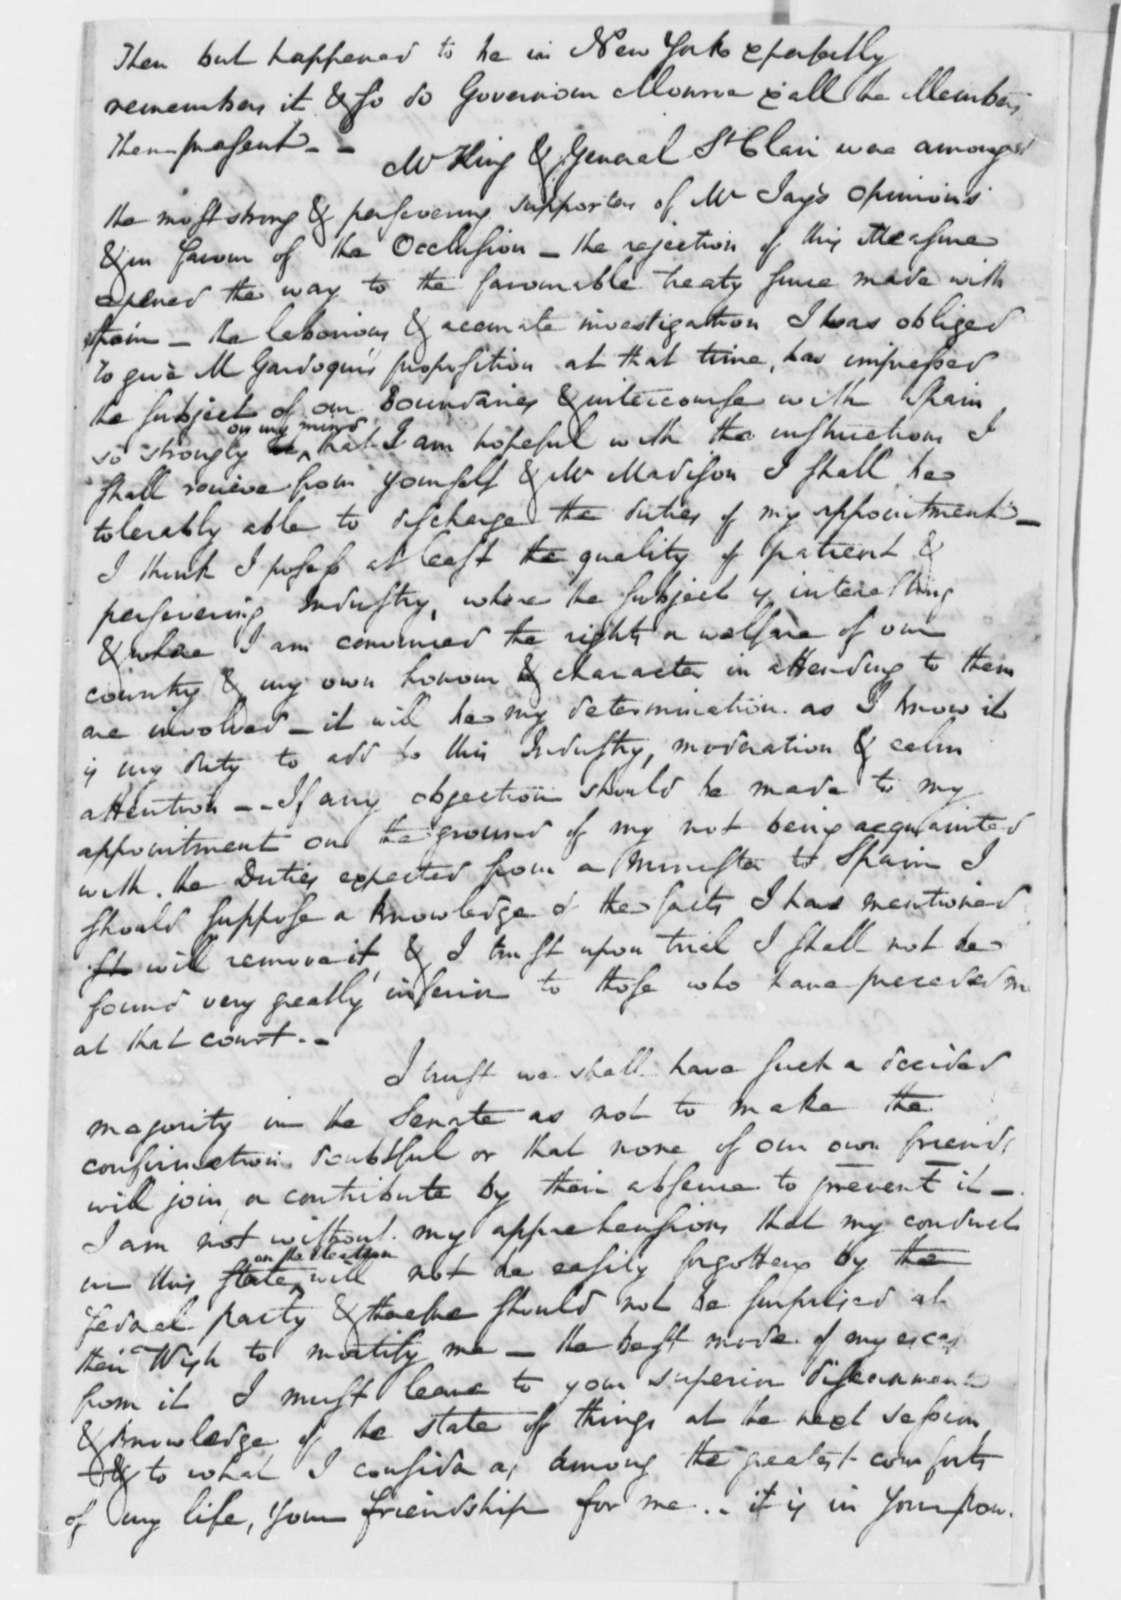 Charles Pinckney to Thomas Jefferson, April 20, 1801